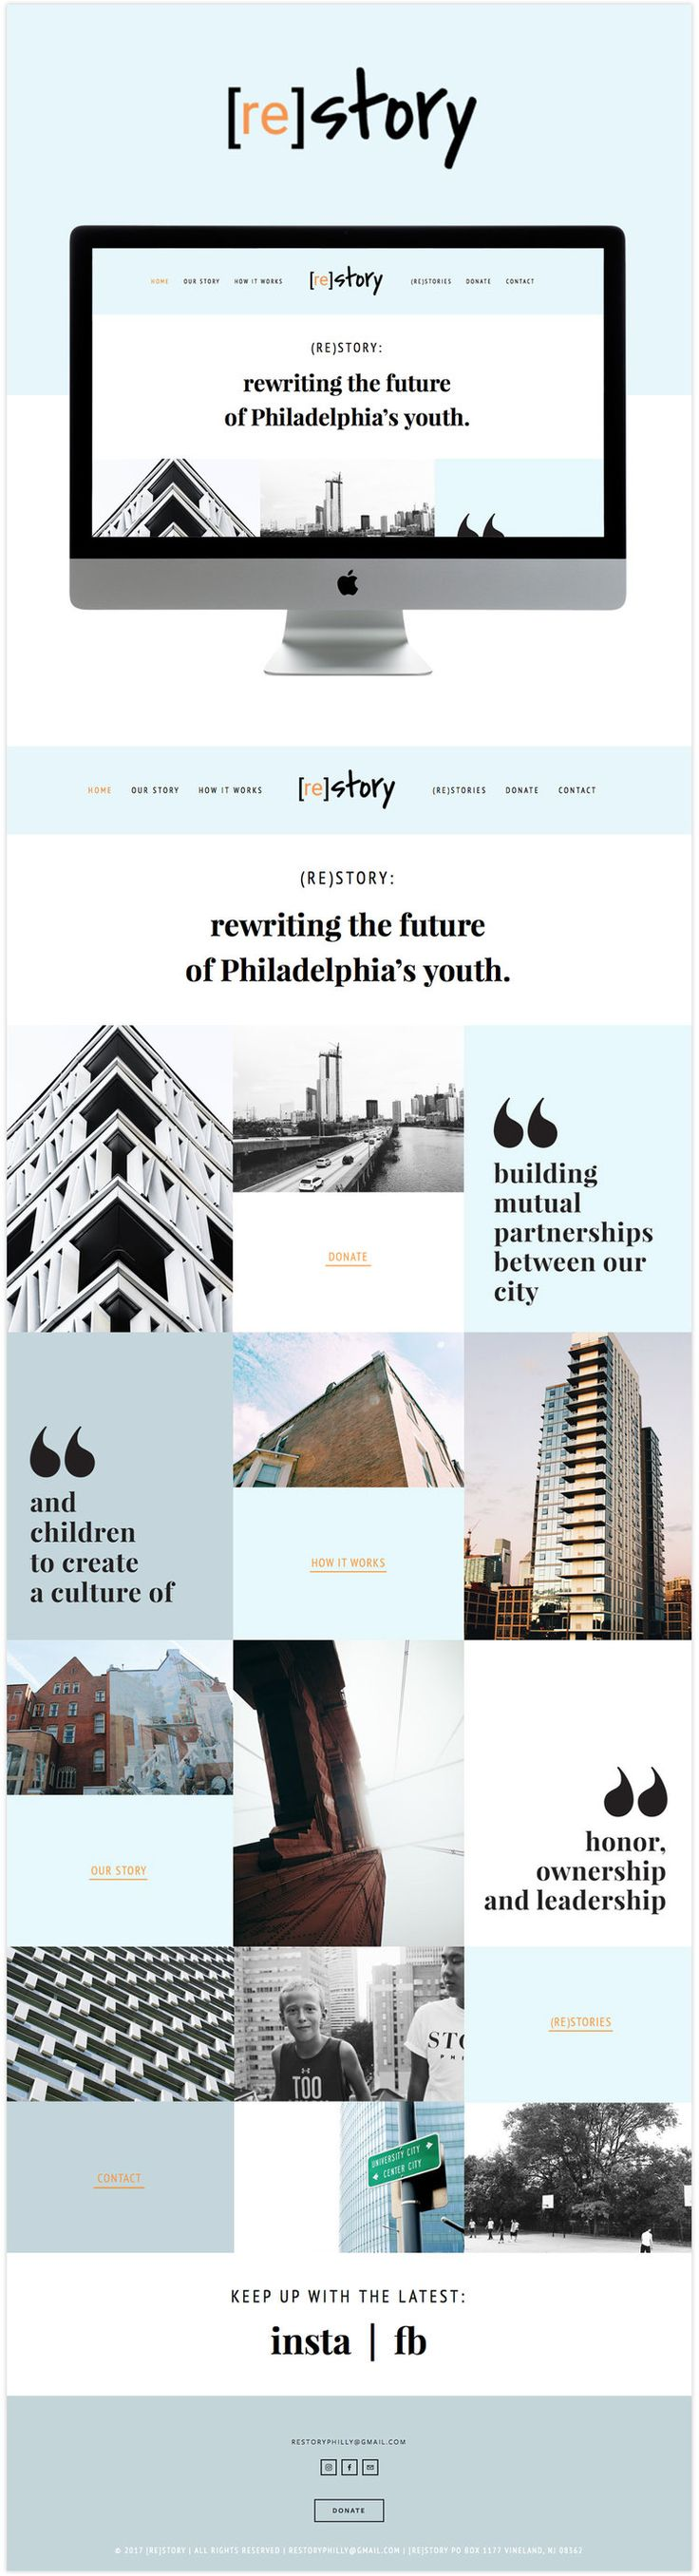 re story website design